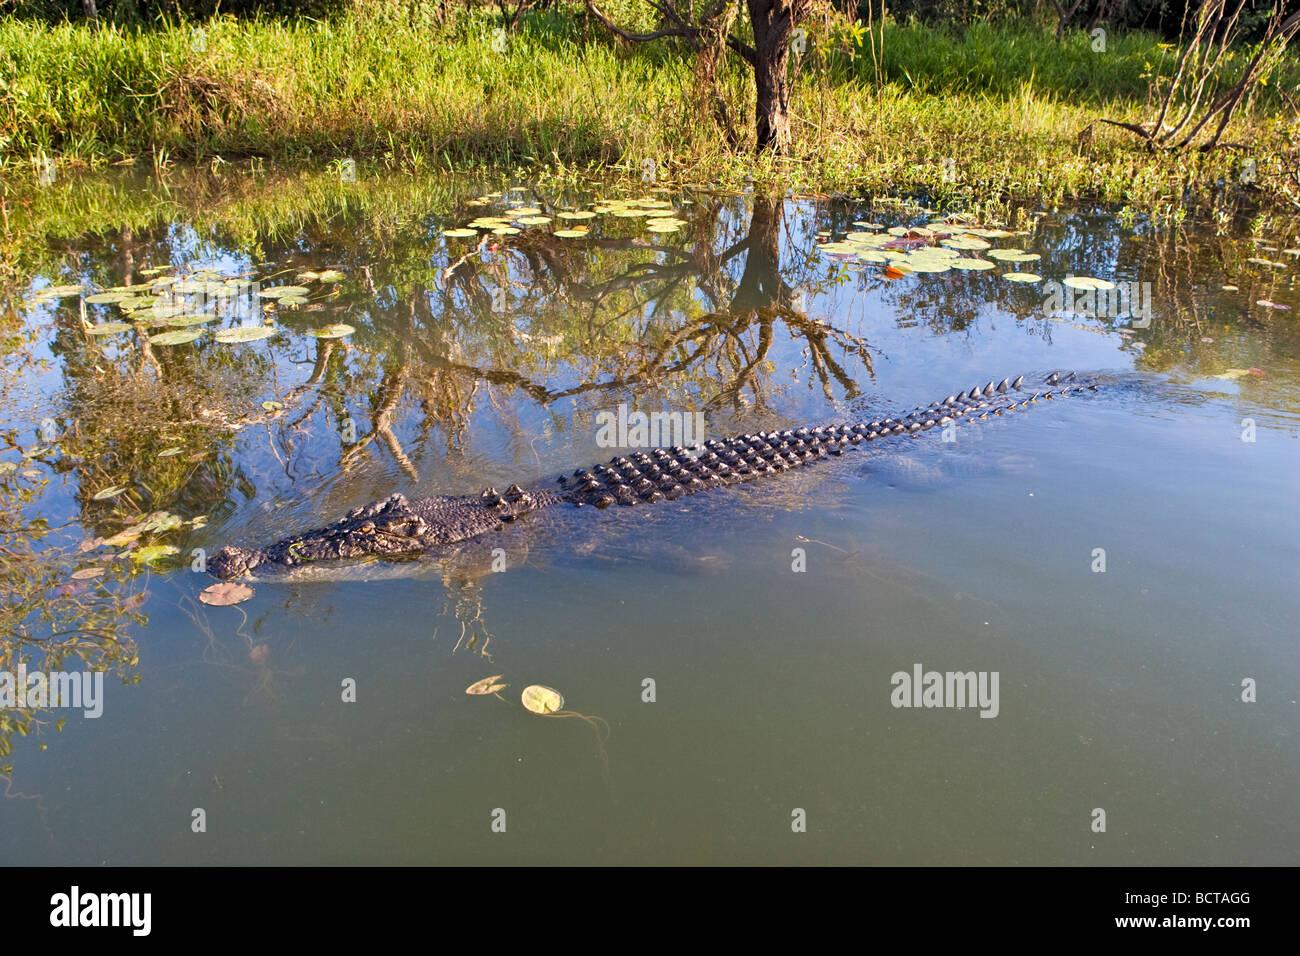 A large Saltwater (Estuarine) Crocodile (Crocodylus porosus) at Yellow Water Billabong in Kakadu National Park. - Stock Image